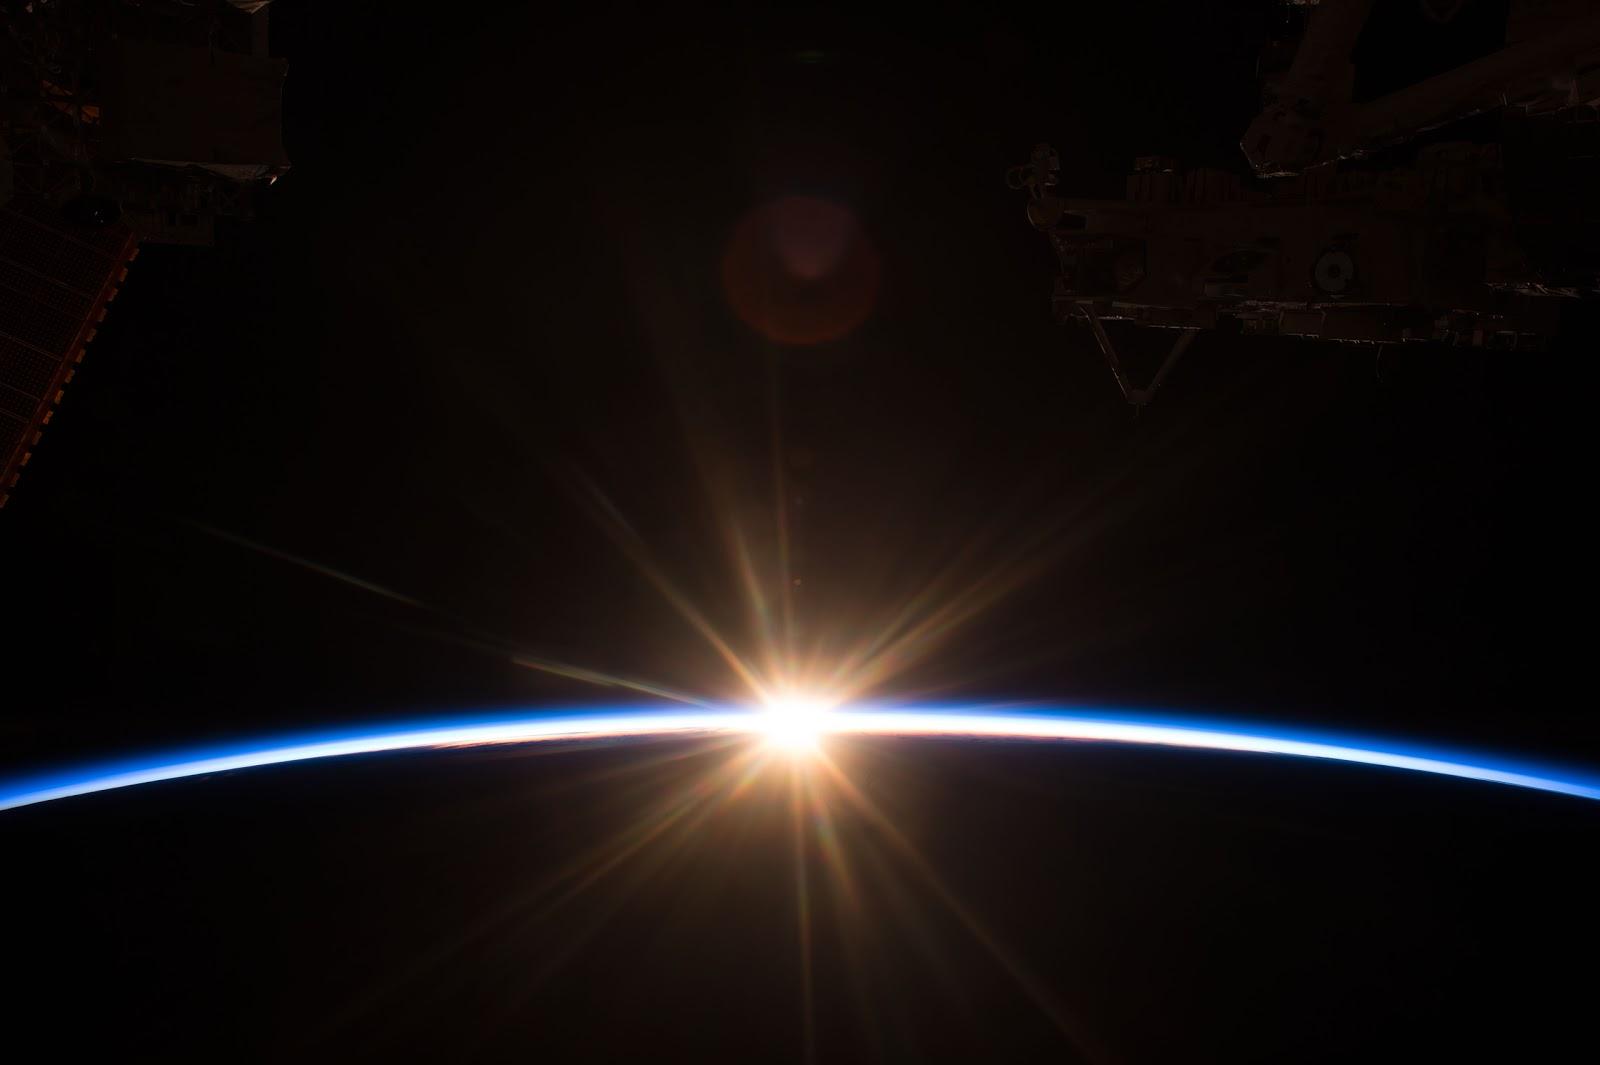 sunrise from international space station - photo #2